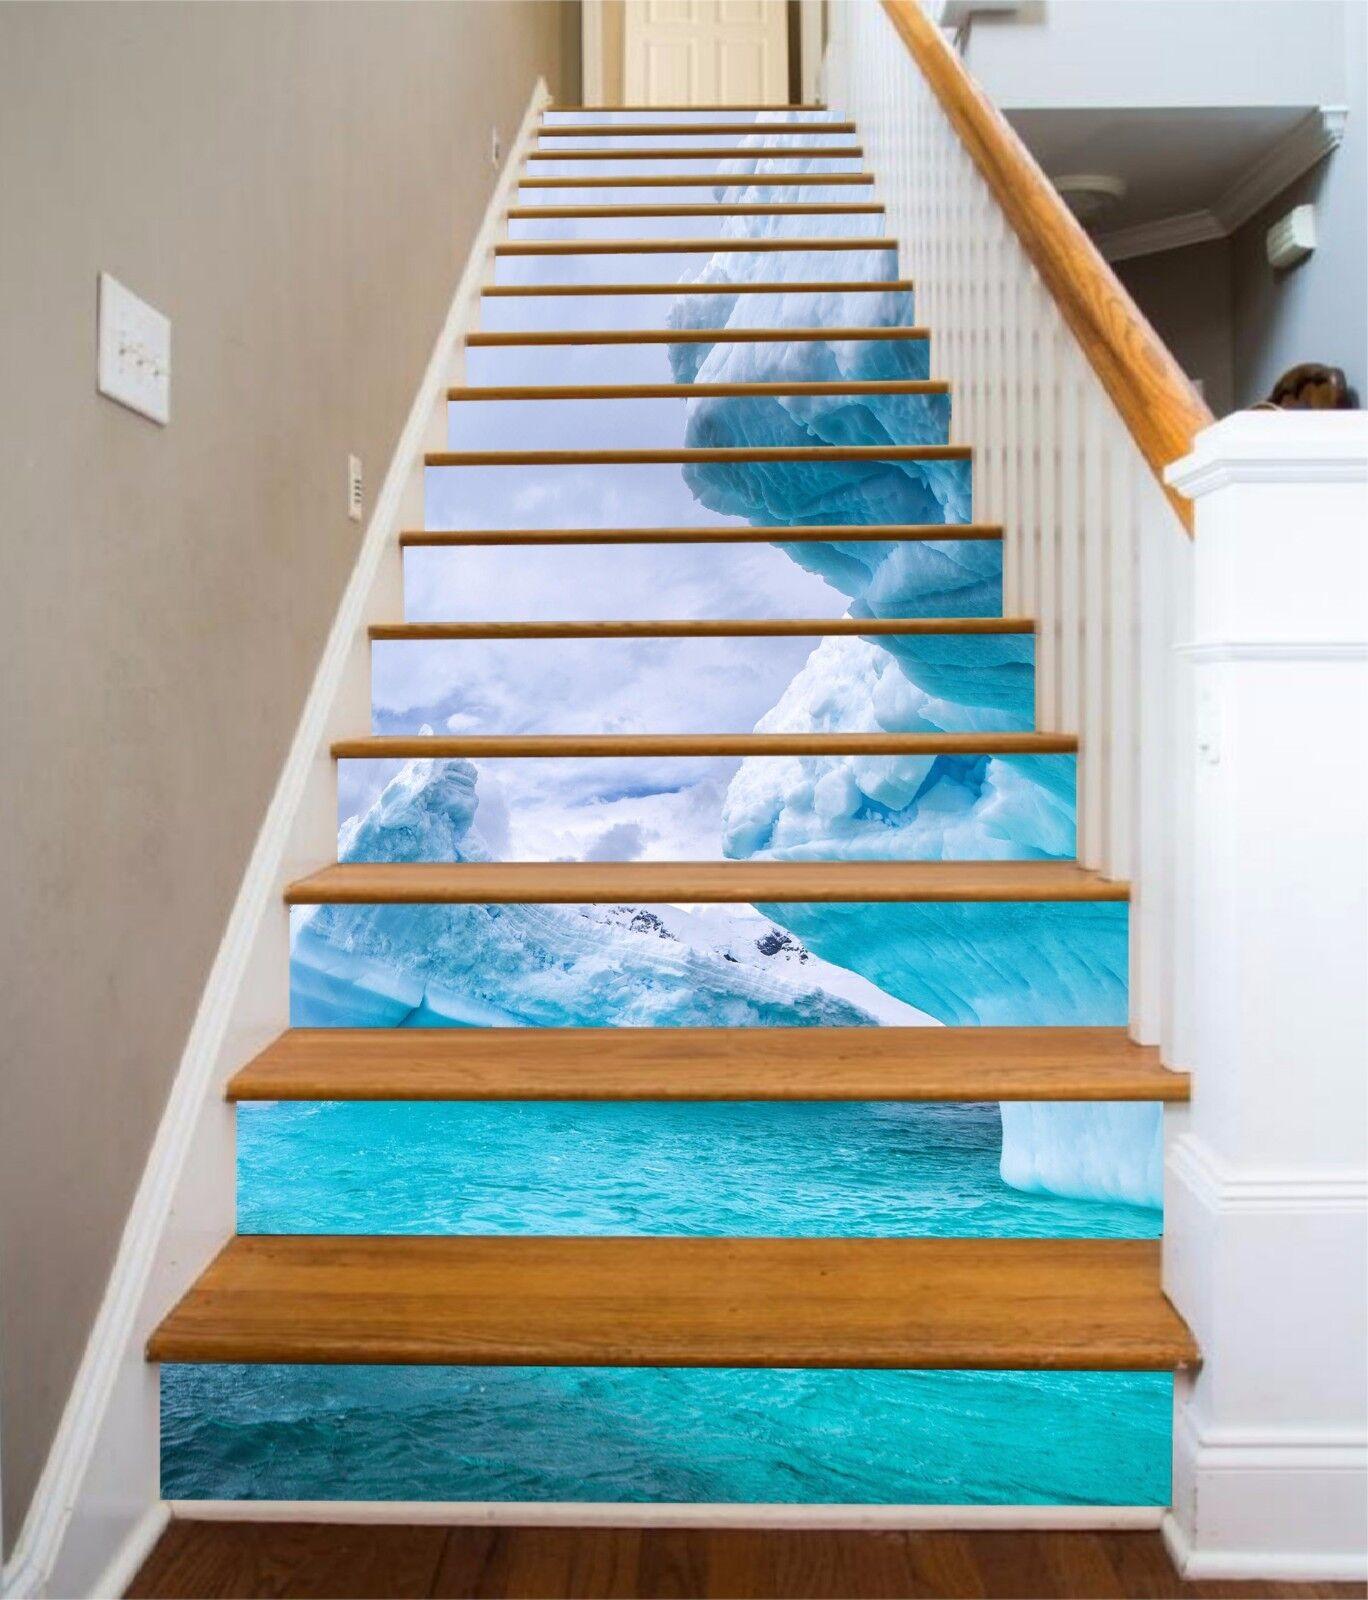 3D Blau seawater 223 Risers Decoration Photo Mural Vinyl Decal WandPapier US